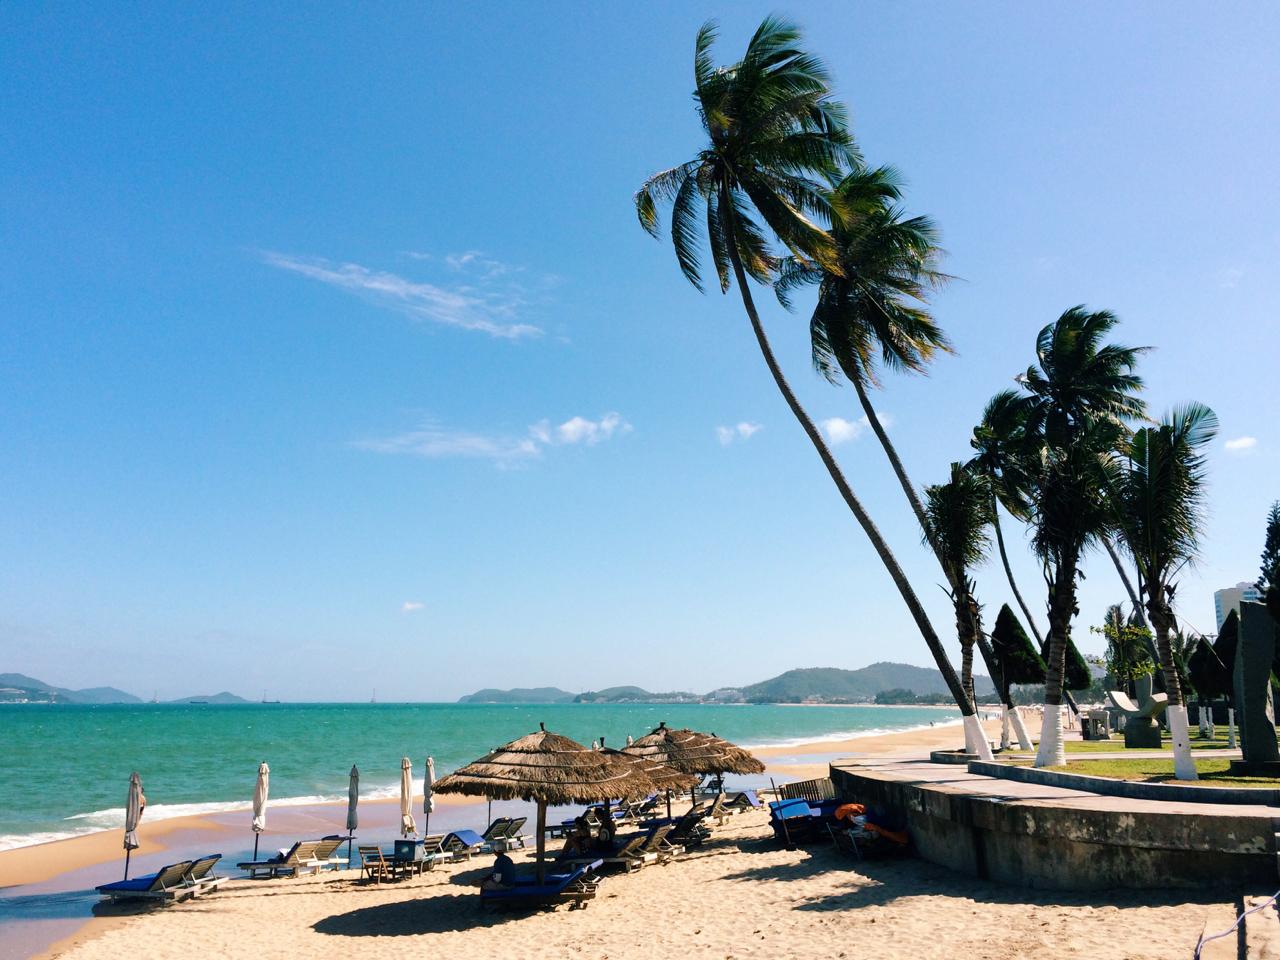 Путешествие по Вьетнаму, Нячанг: Лежаки на пляже